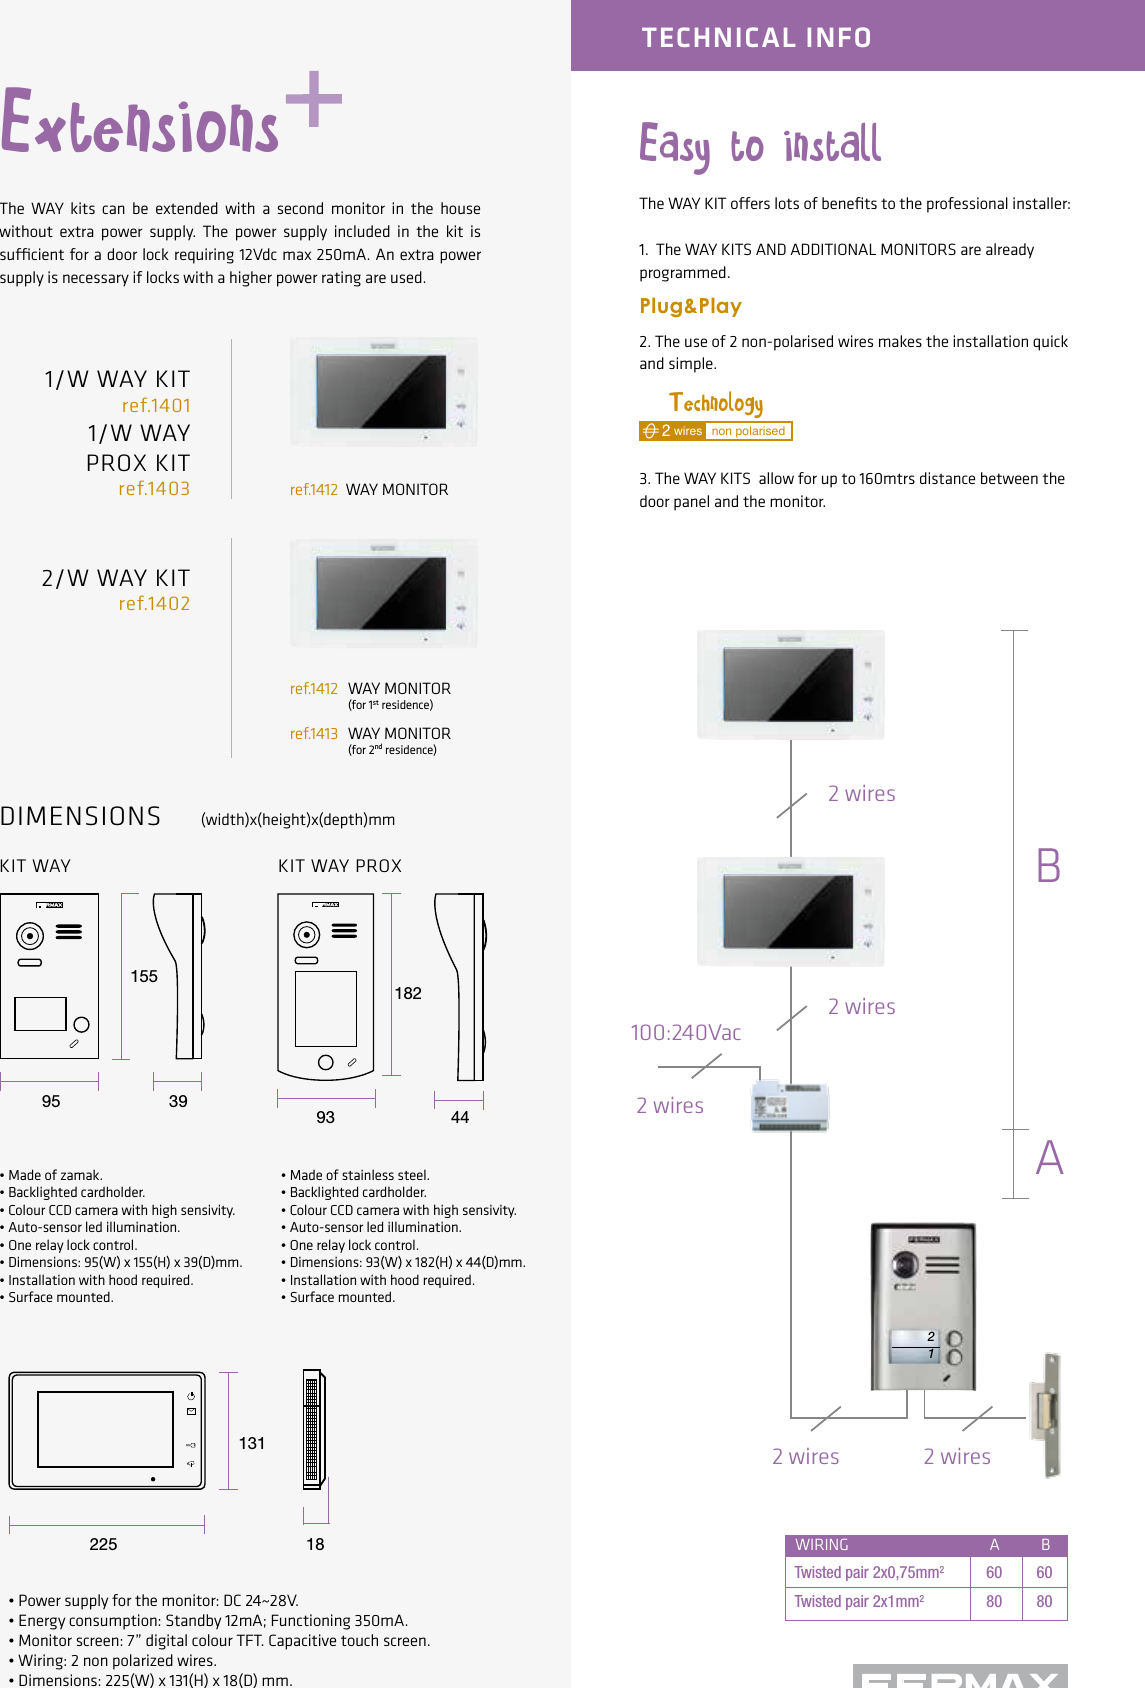 Pu01355 Way Kits 2 Wire Proximity Sensor Wiring Diagram Page 7 Of 8